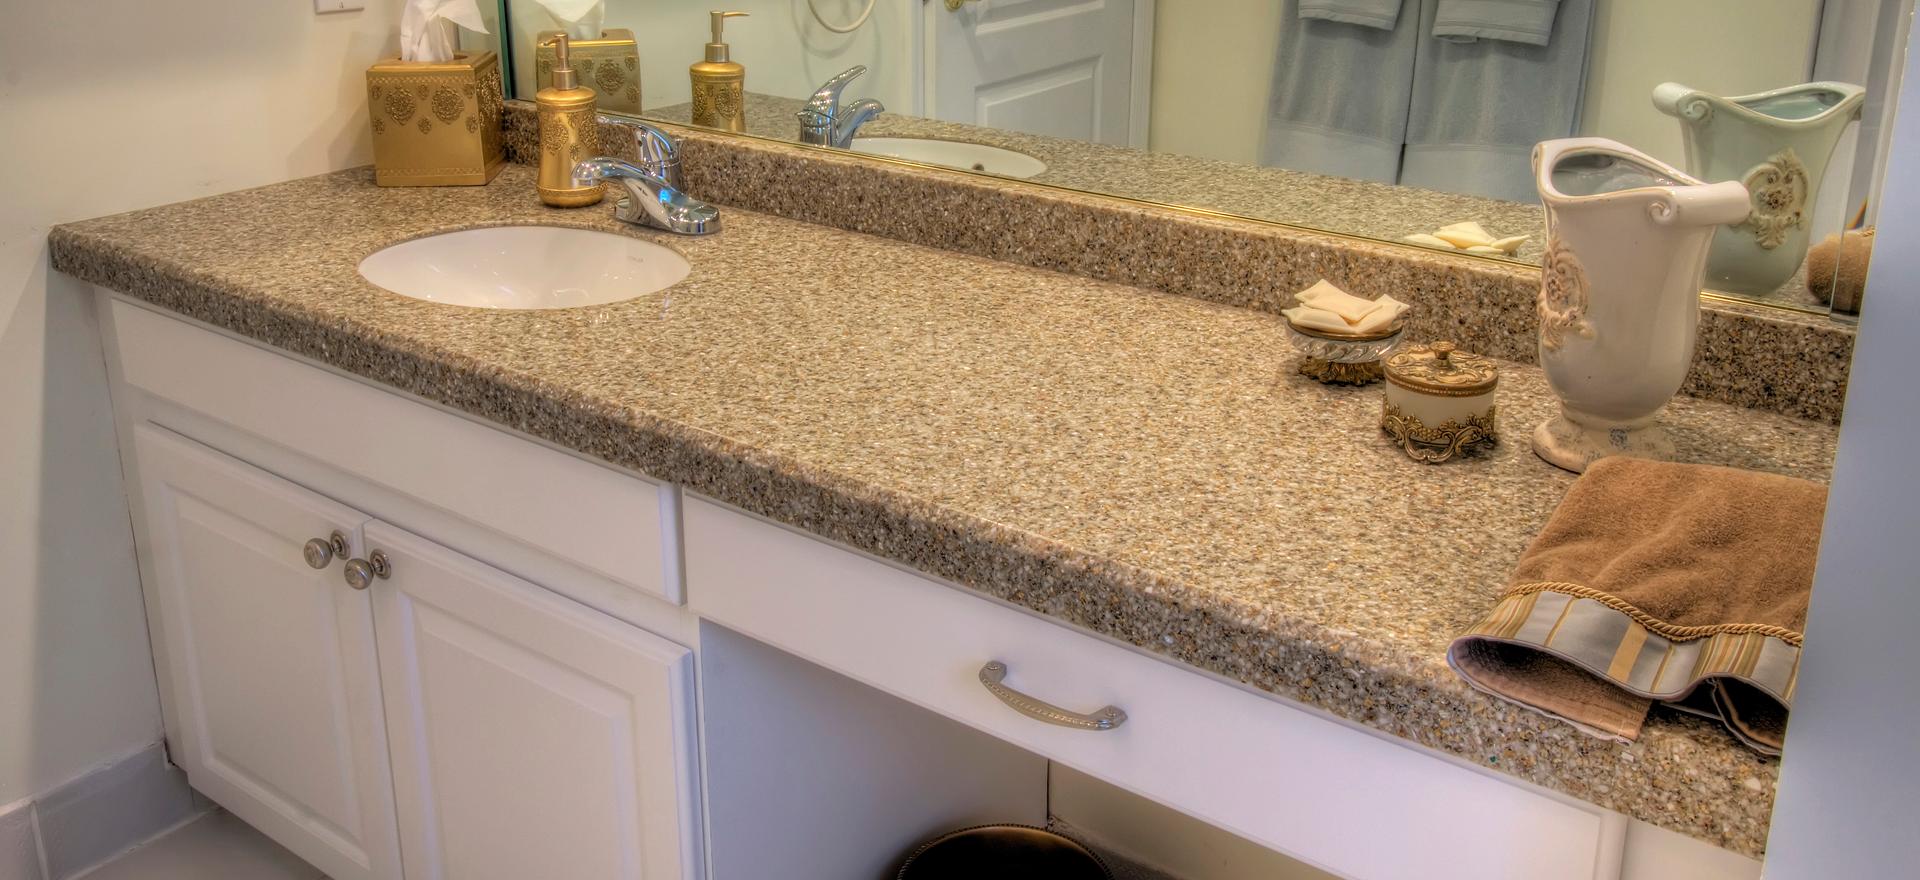 Bathroom Remodeling Oro Valley AZ FREE IN HOME ESTIMATES